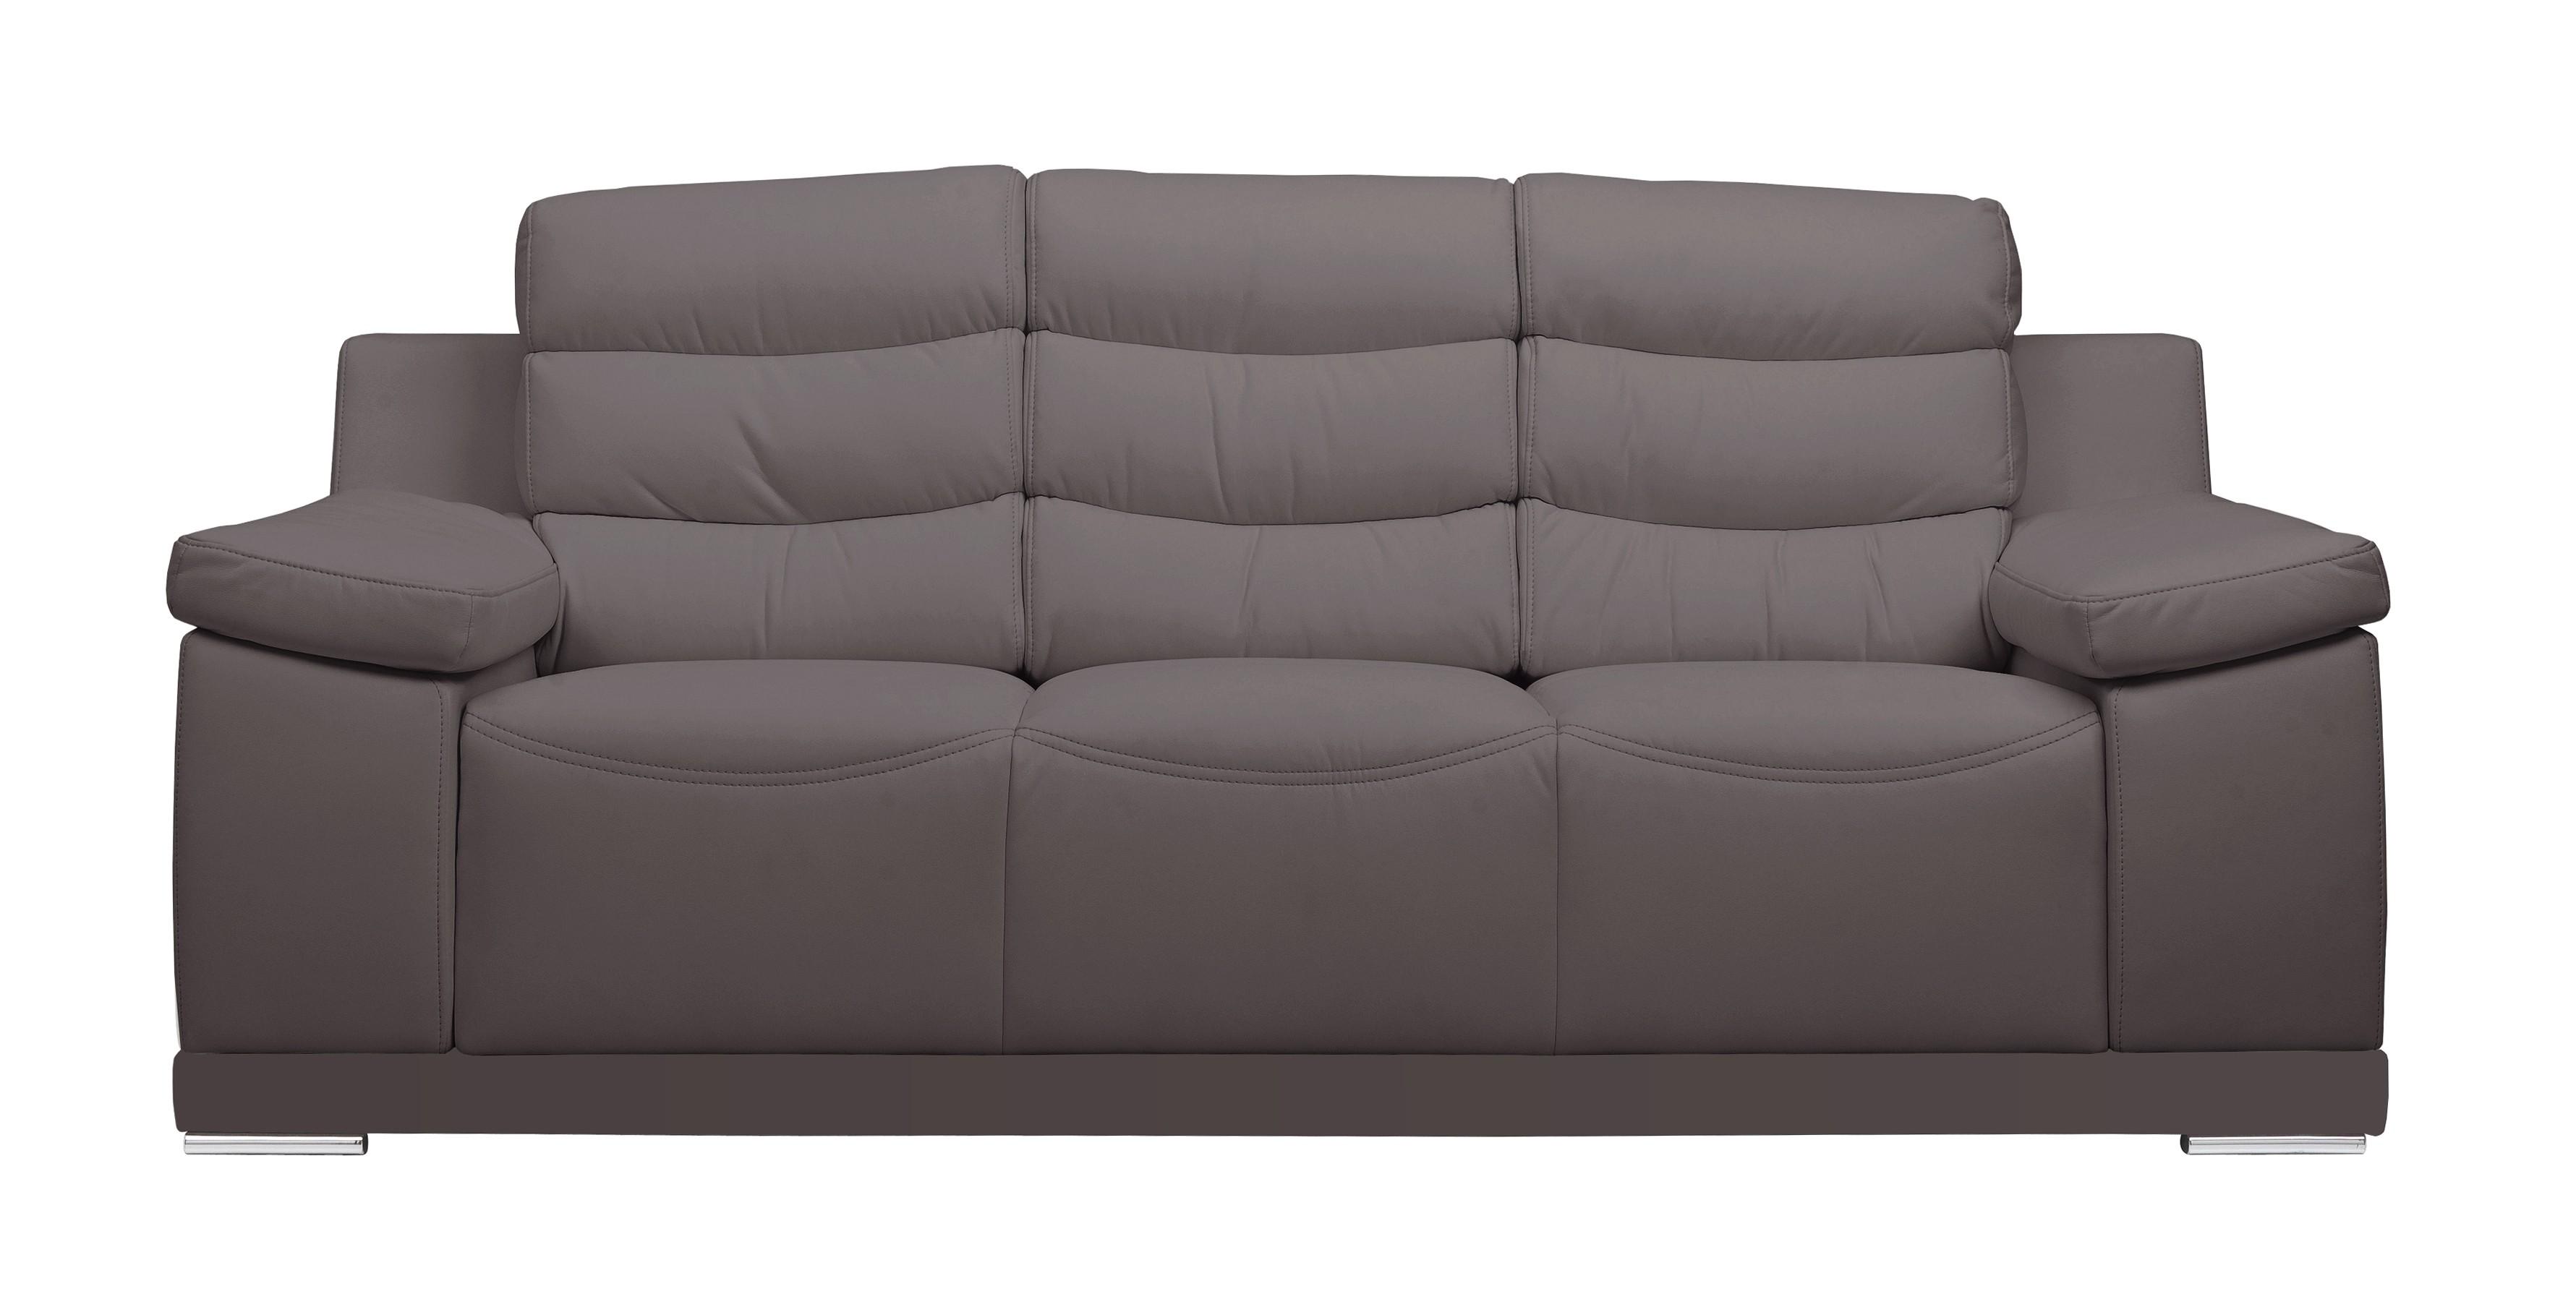 grand canapé de salon 3 places design en cuir goran - gdegdesign